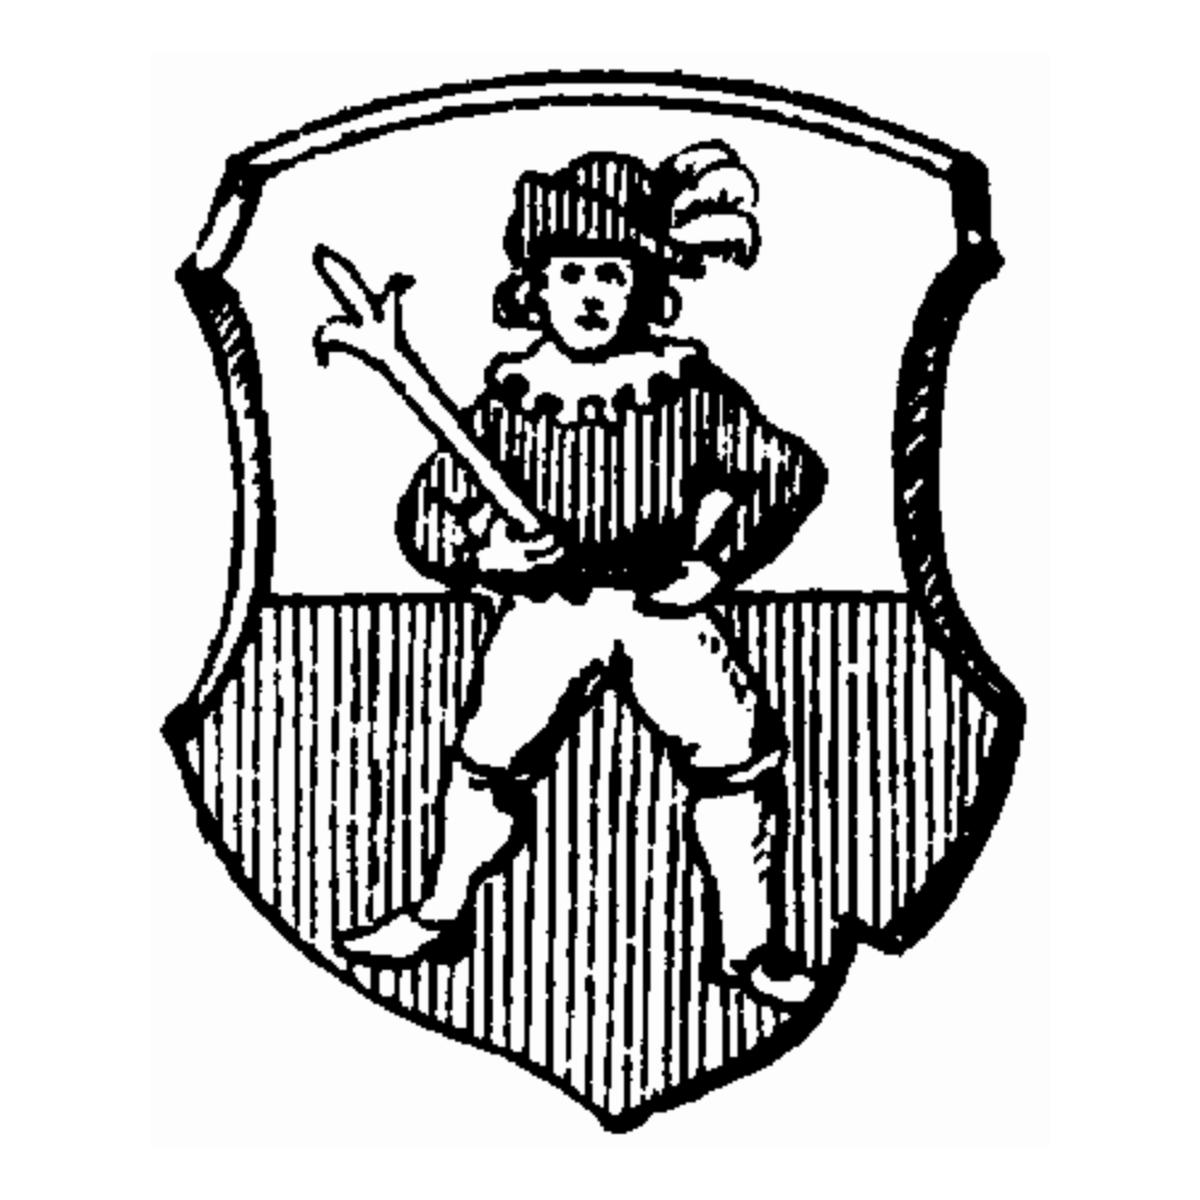 Borghardt